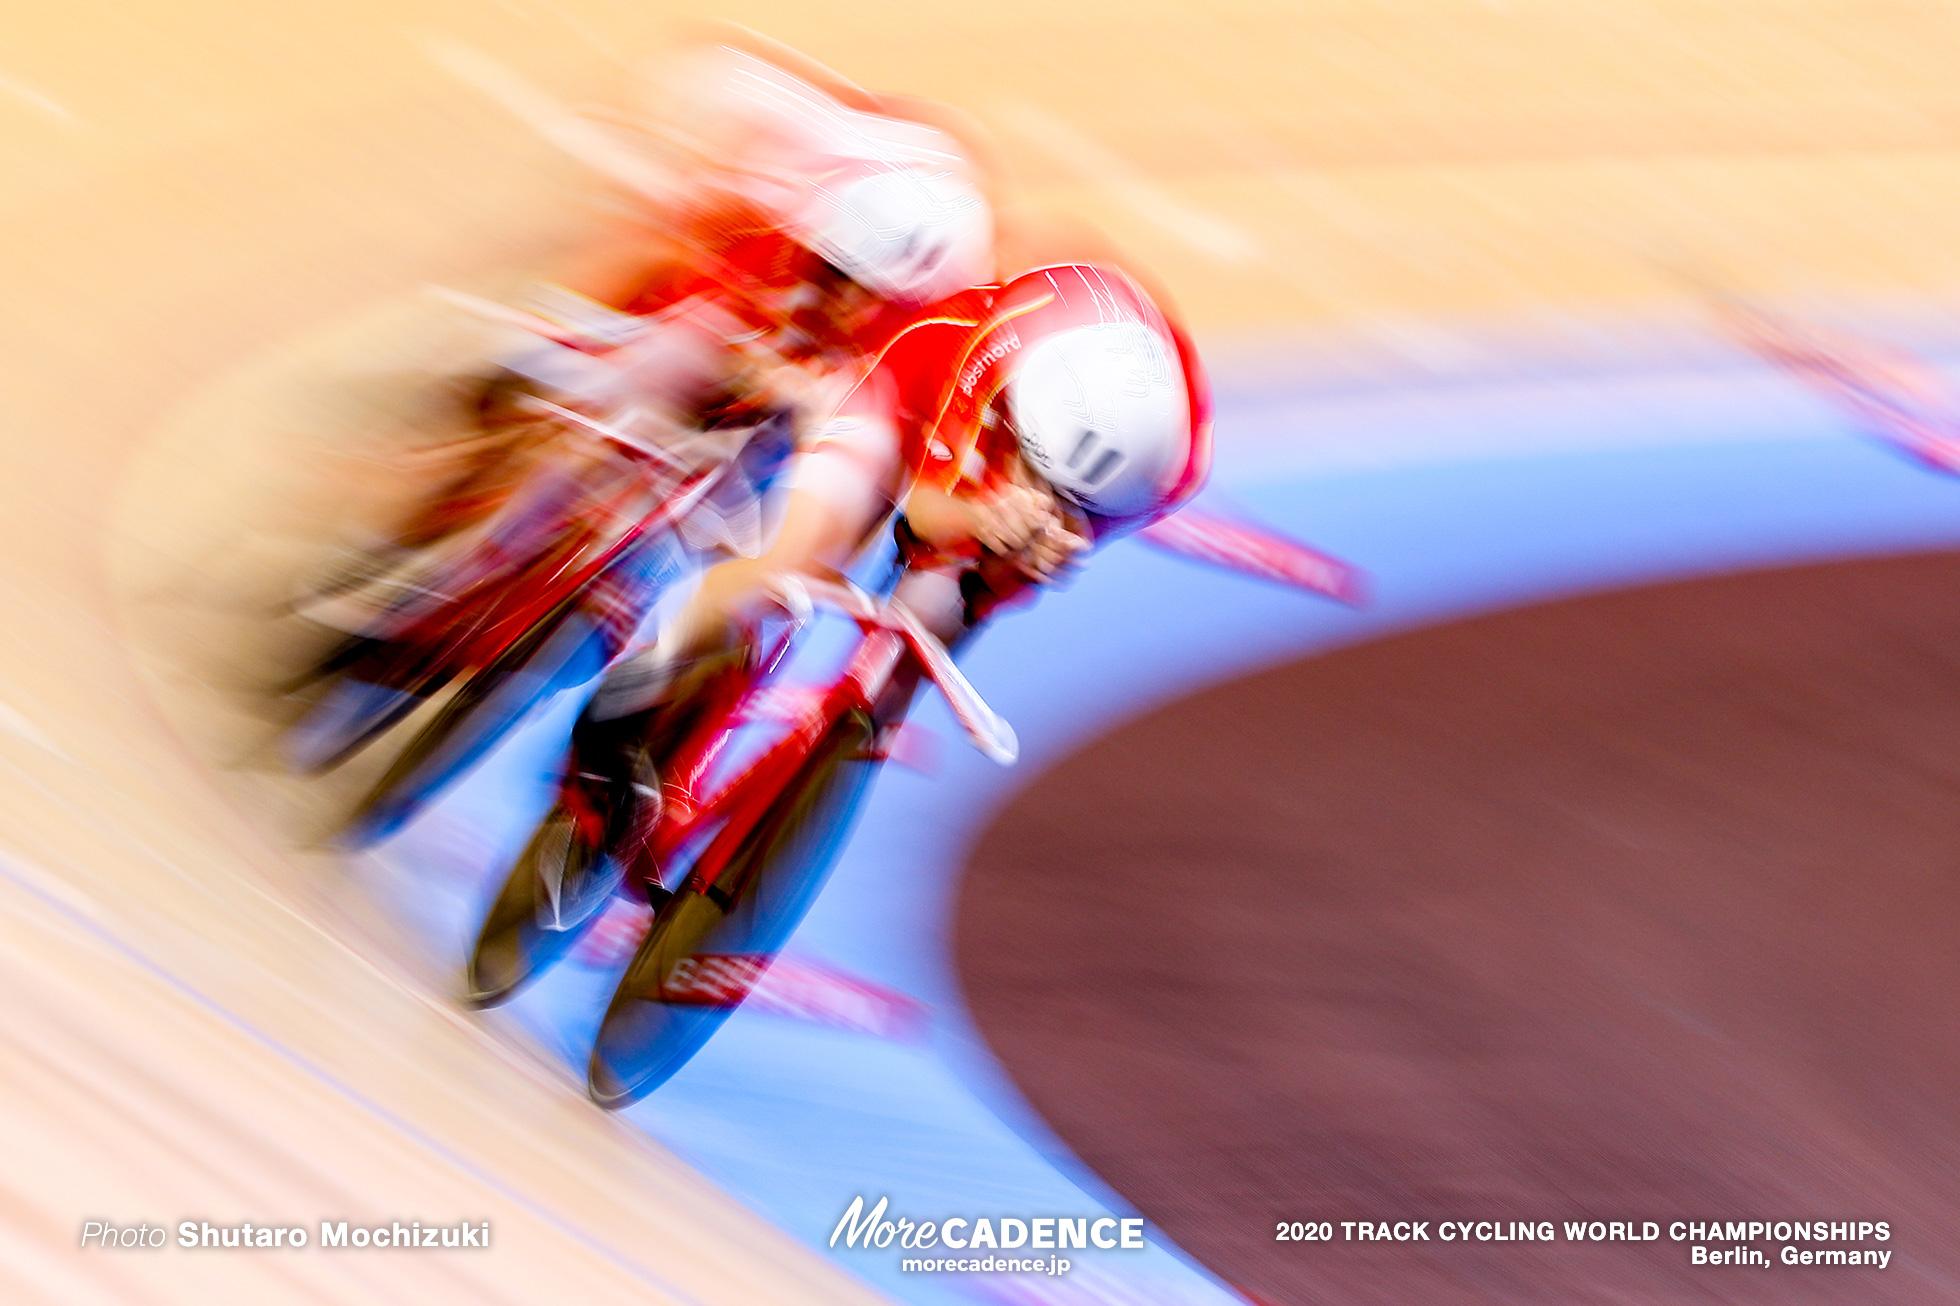 Final / Men's Team Pursuit / 2020 Track Cycling World Championships / Denmark デンマーク / lasse Norman Hansen ラッセ ノーマン・ハンセン, Julius Johansen ジュリアス・ヨハンセン, Frederik Rodenberg Madsen フレデリック・マドセン, Rasmus Pedersen ラスムス・ペダーセン